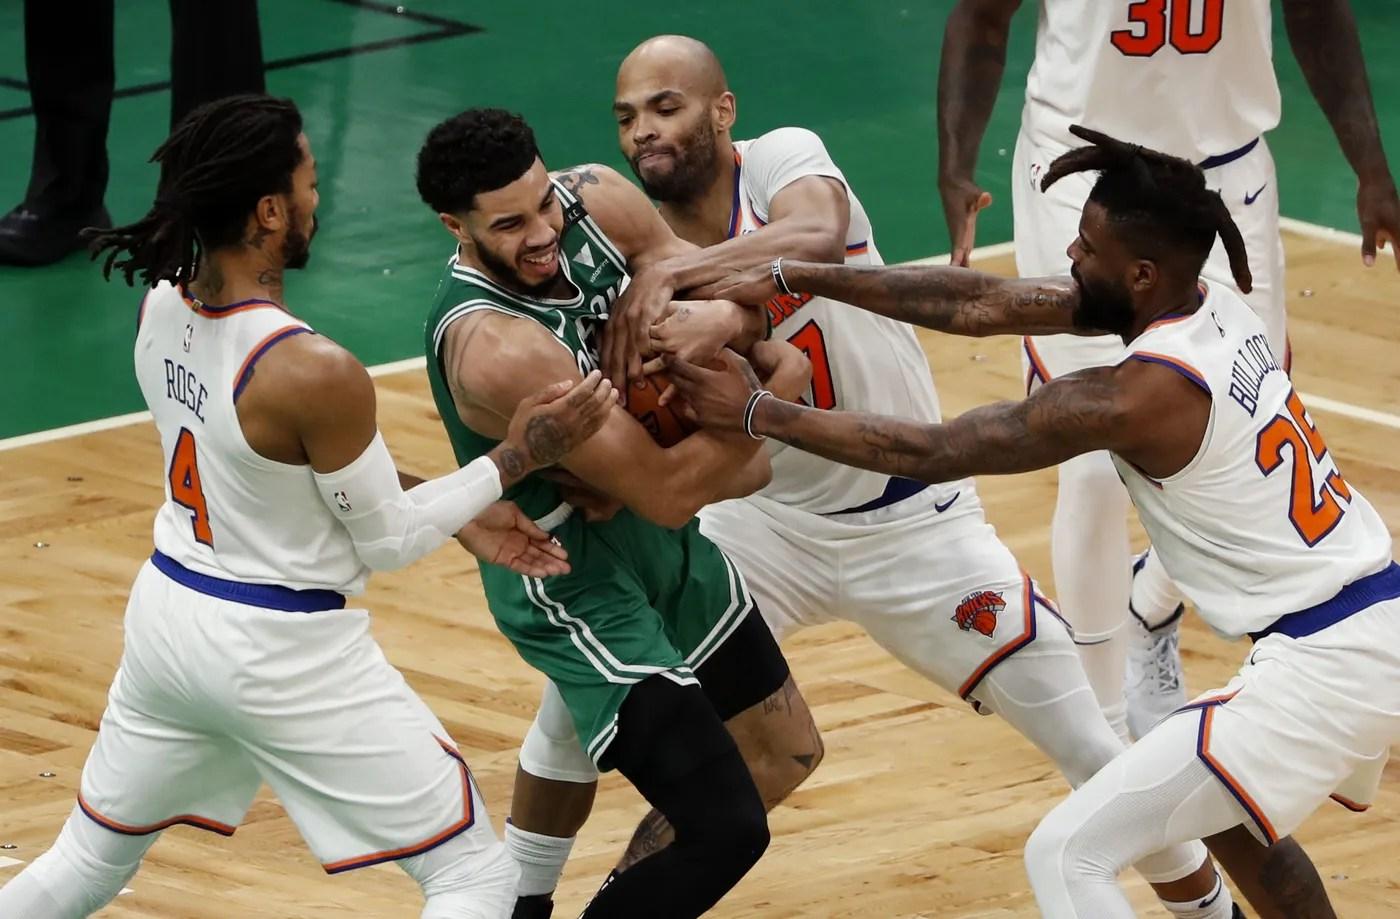 Apr 7, 2021; Boston, Massachusetts, USA; Boston Celtics forward Jayson Tatum (0) battles for the ball with New York Knicks guard Derrick Rose (4), center Taj Gibson (67) and New York Knicks forward Reggie Bullock (25) during the second quarter at TD Garden.